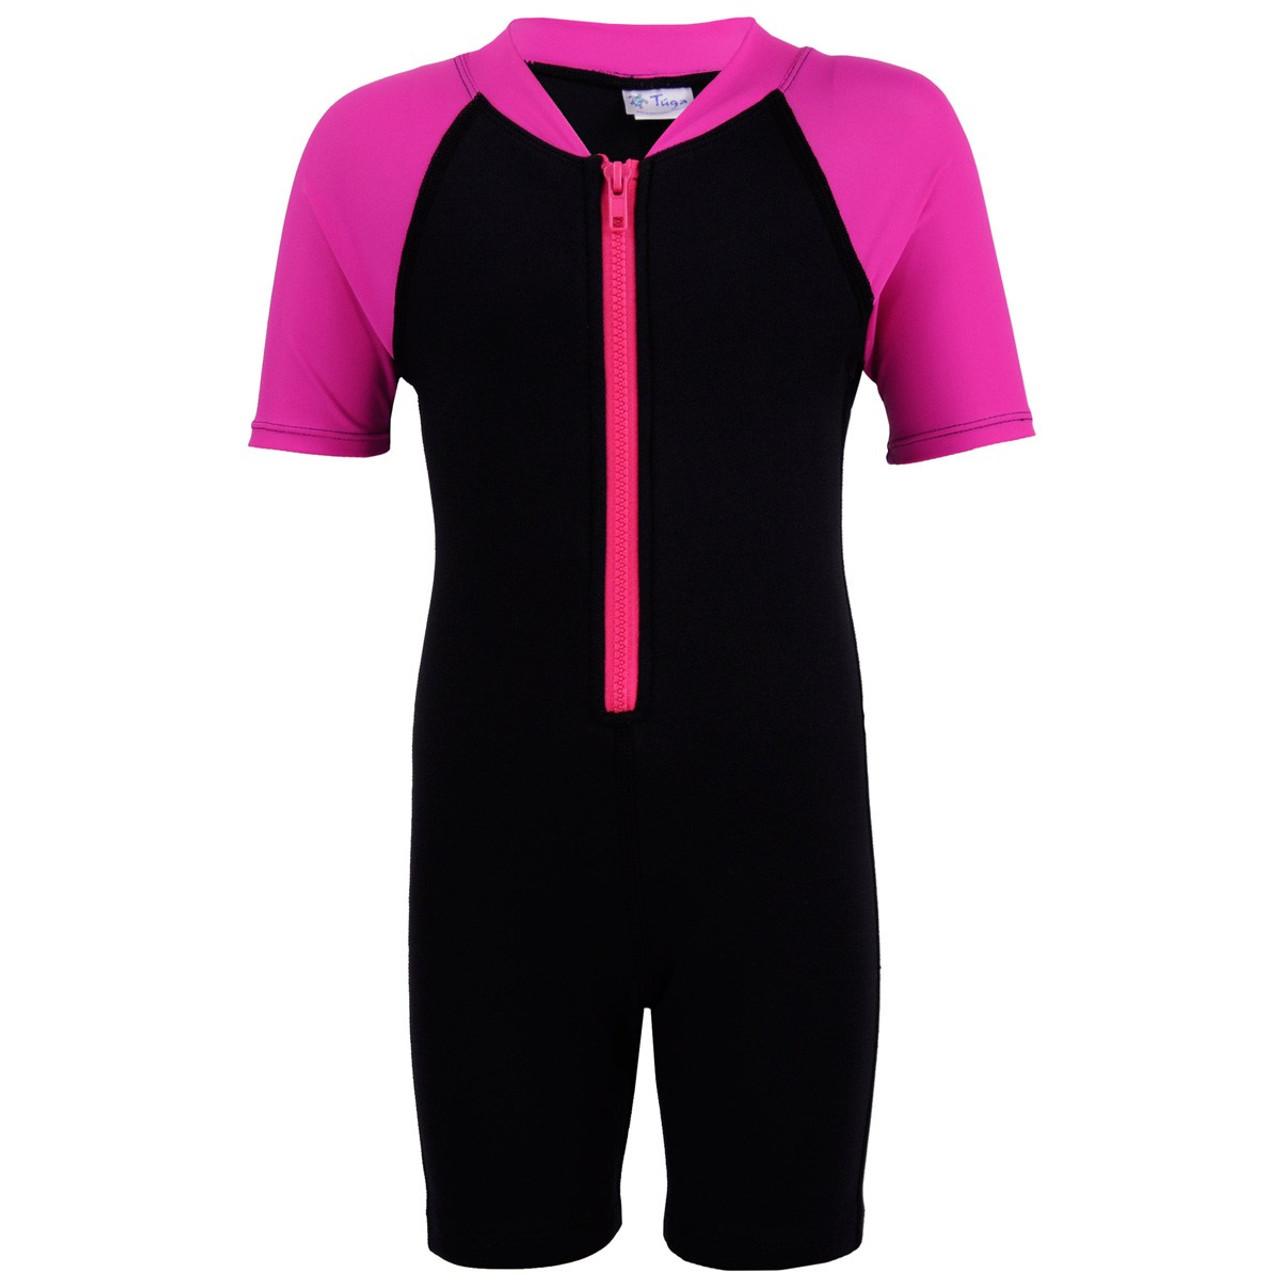 c1ec2ecf688f1 Tuga Girls UV Thermal Wetsuit Swimsuit Pink | Girls UV Clothing